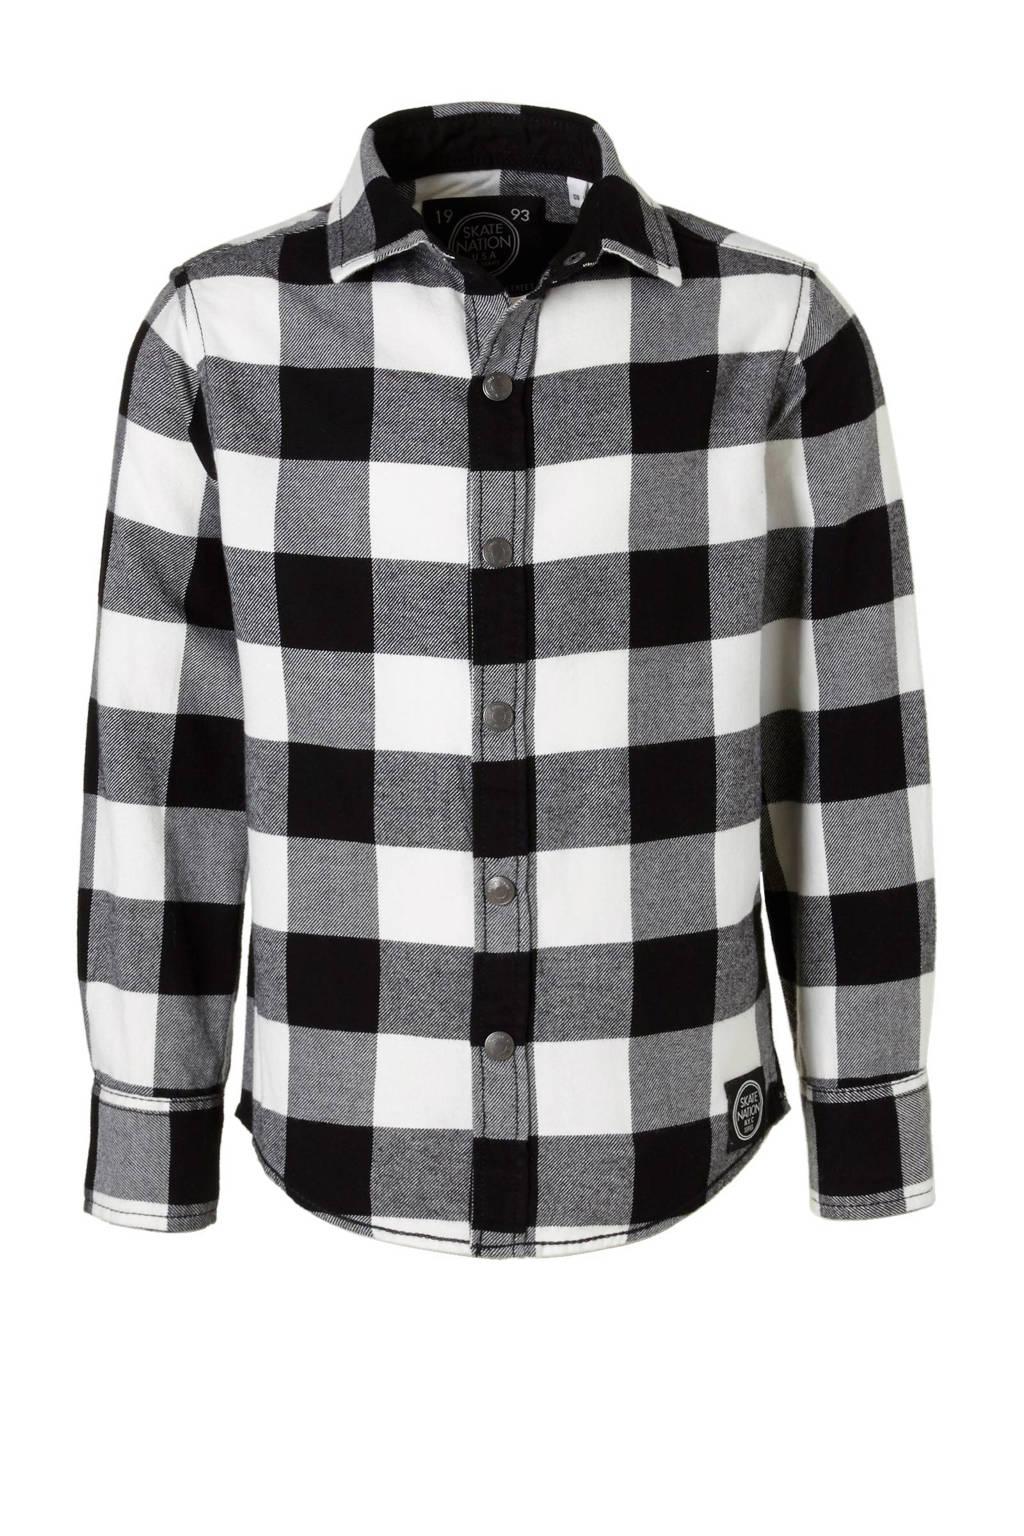 5c80cbf0f22 C&A Here & There overhemd, Zwart/grijs/ecru